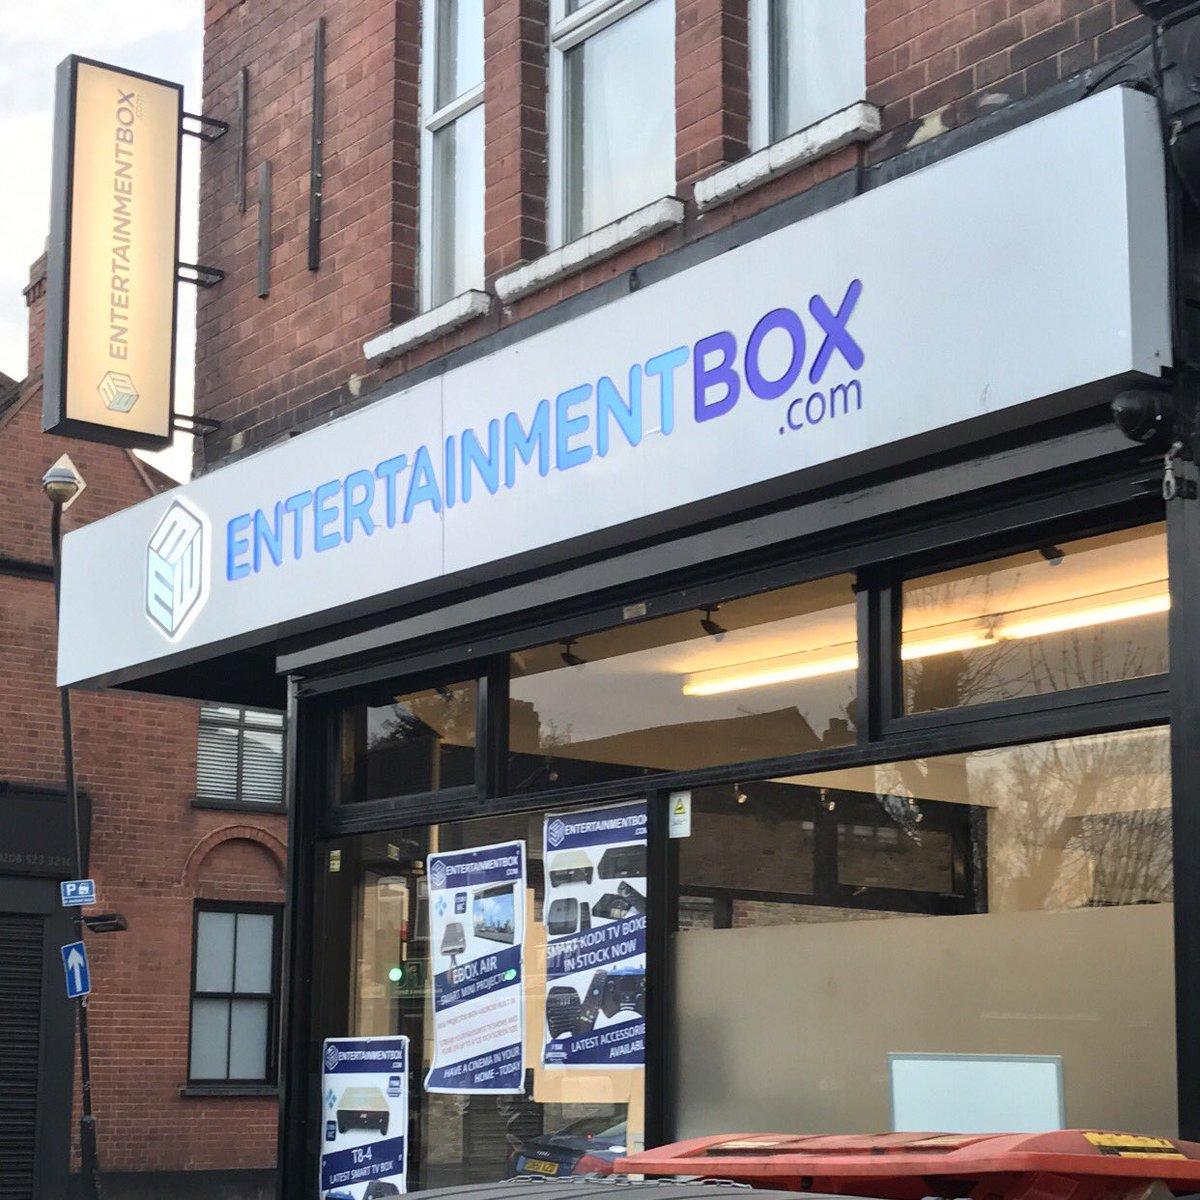 entertainmentbox hashtag on Twitter